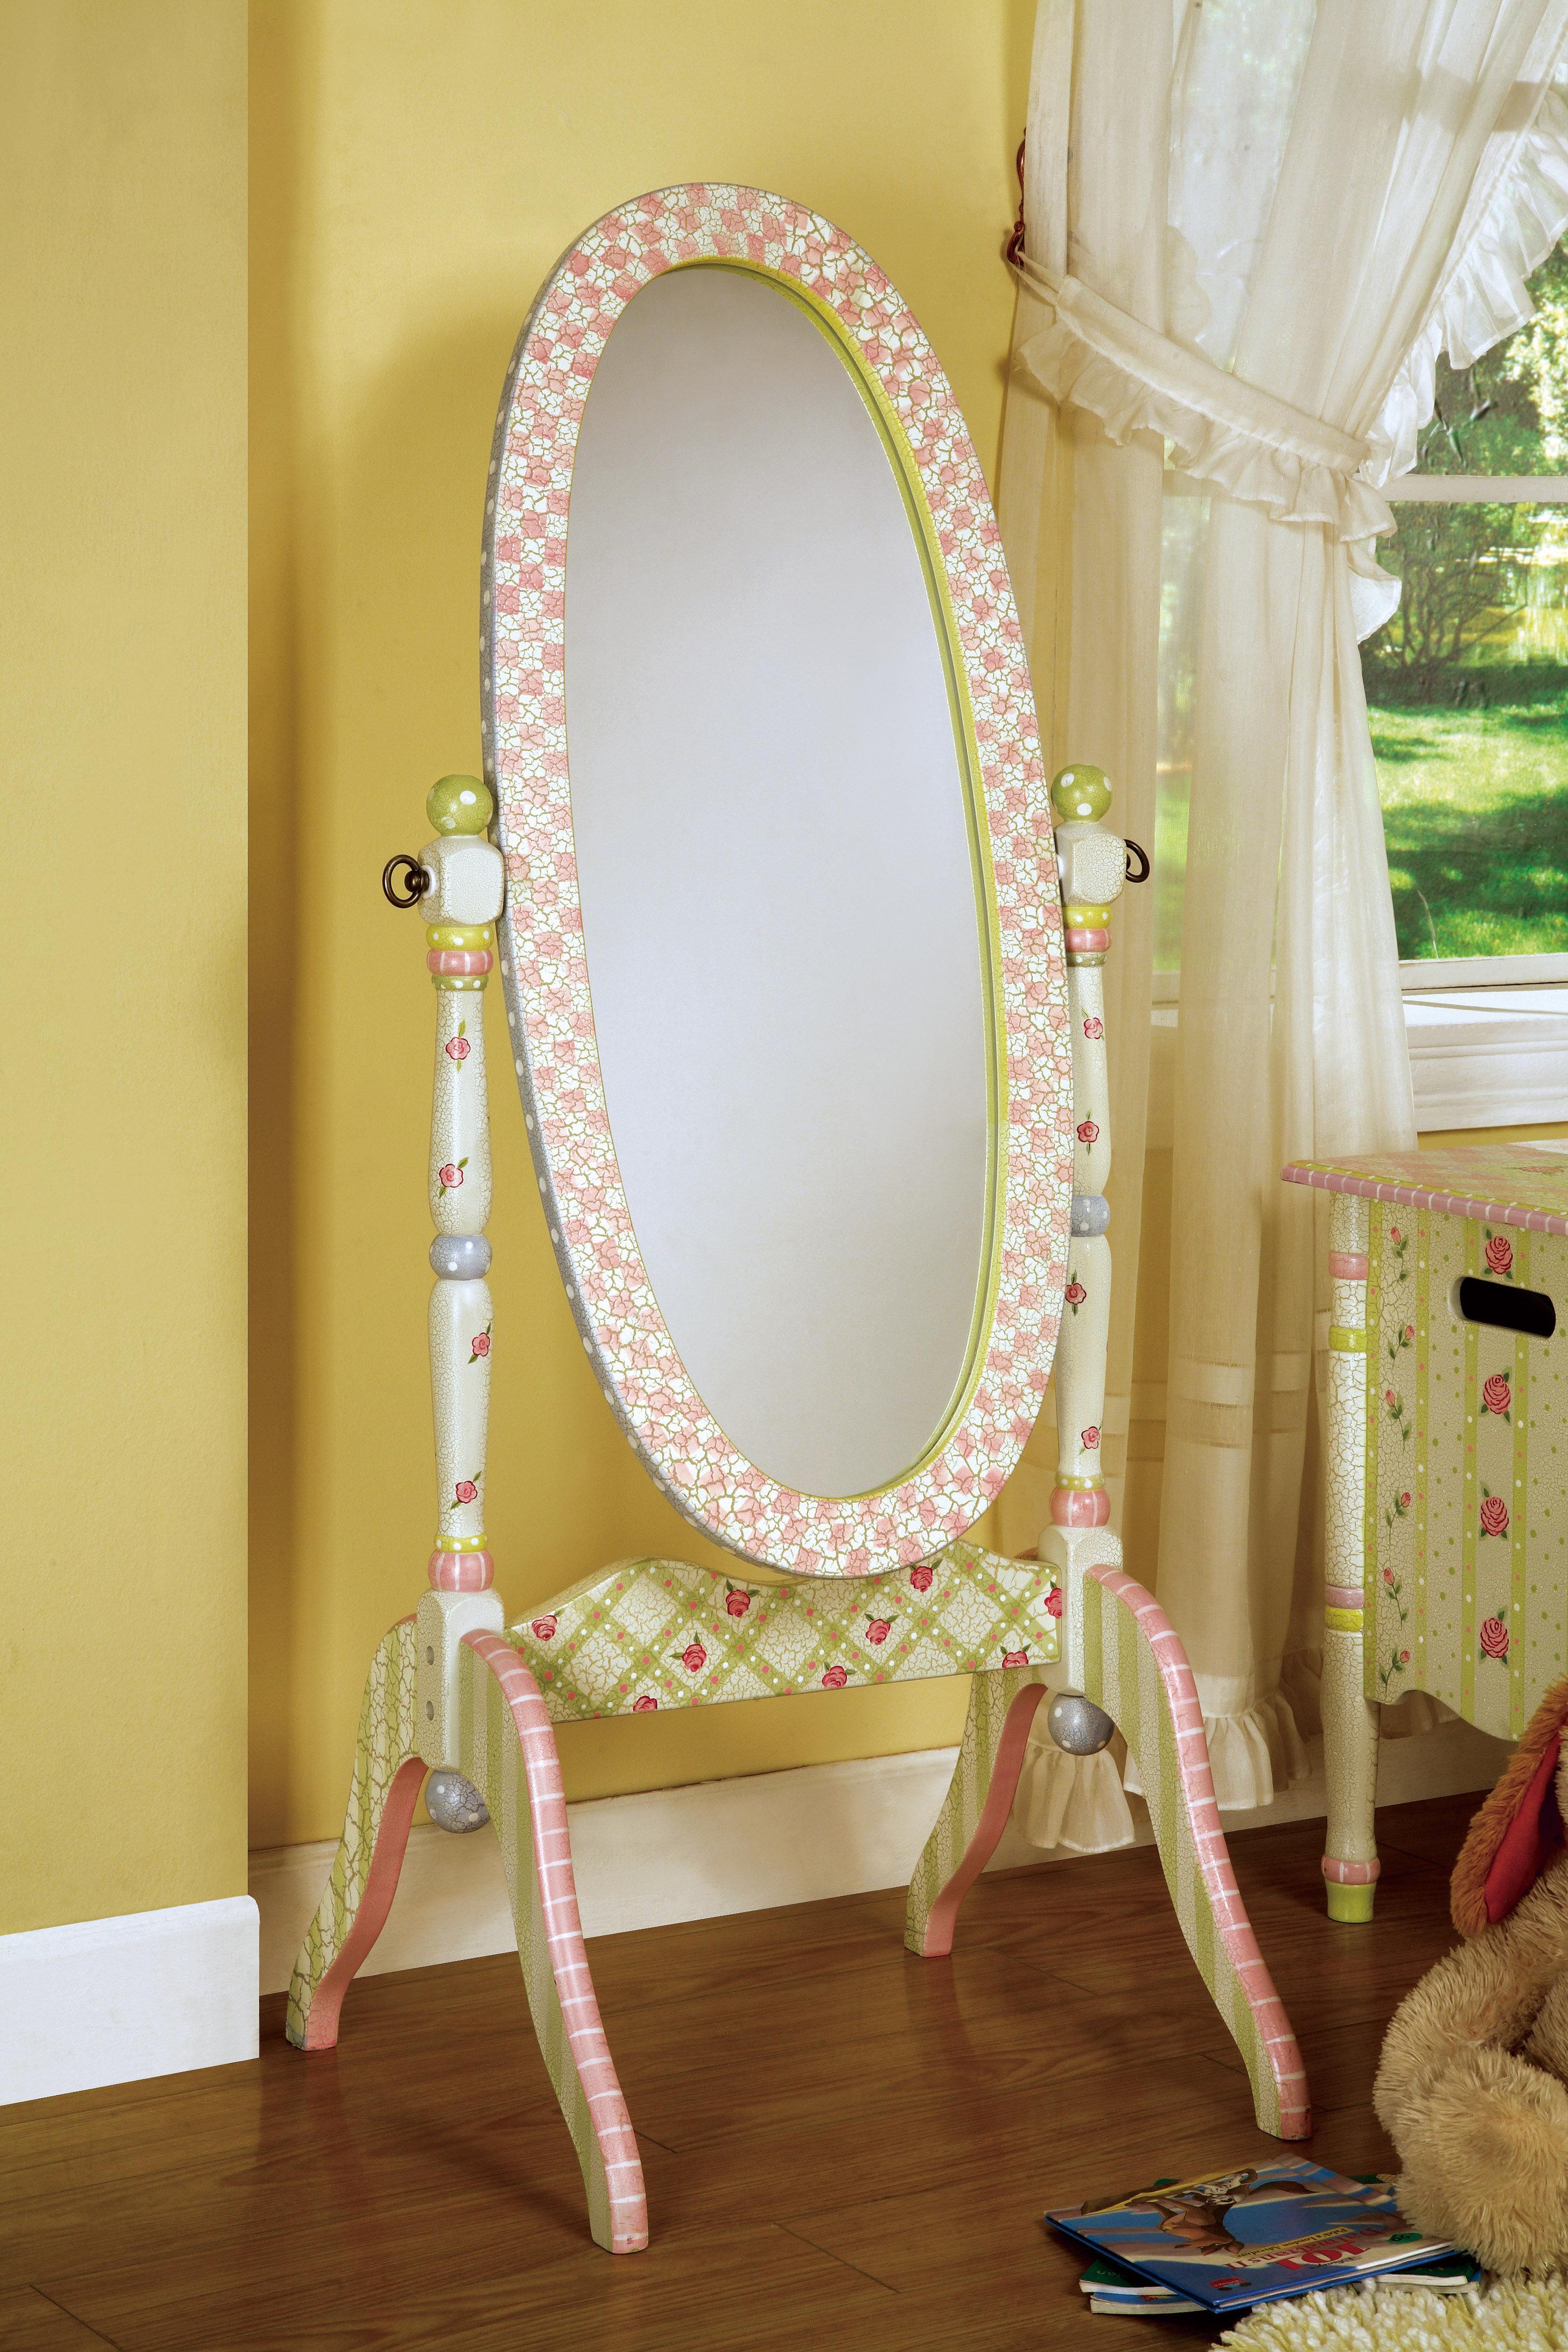 Contemporary Small Decorative Wall Mirror Set Inspiration - Art ...